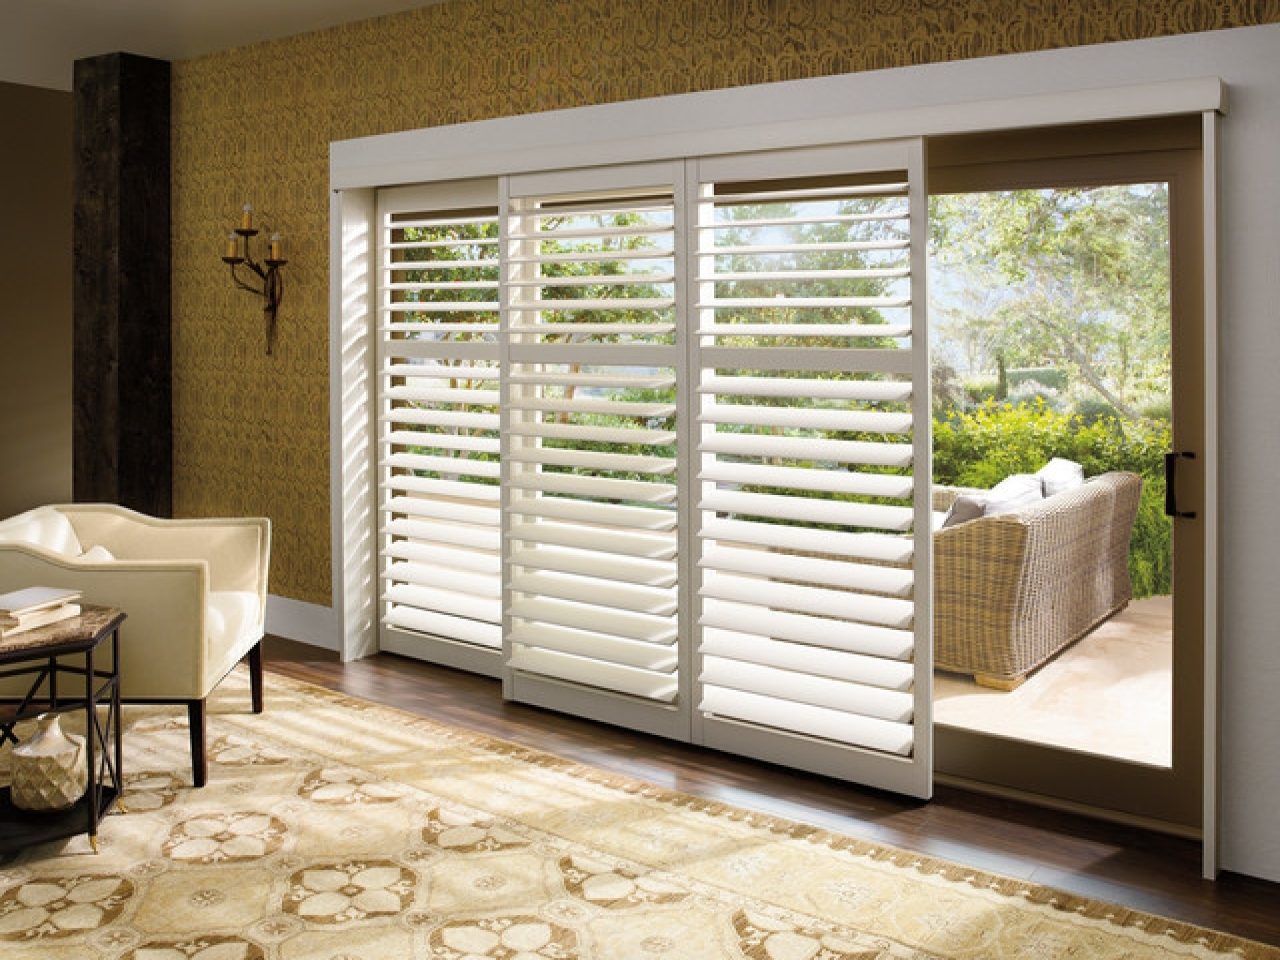 Overlapping Sliding Patio Doorswindow treatments for sliding glass doors ideas tips